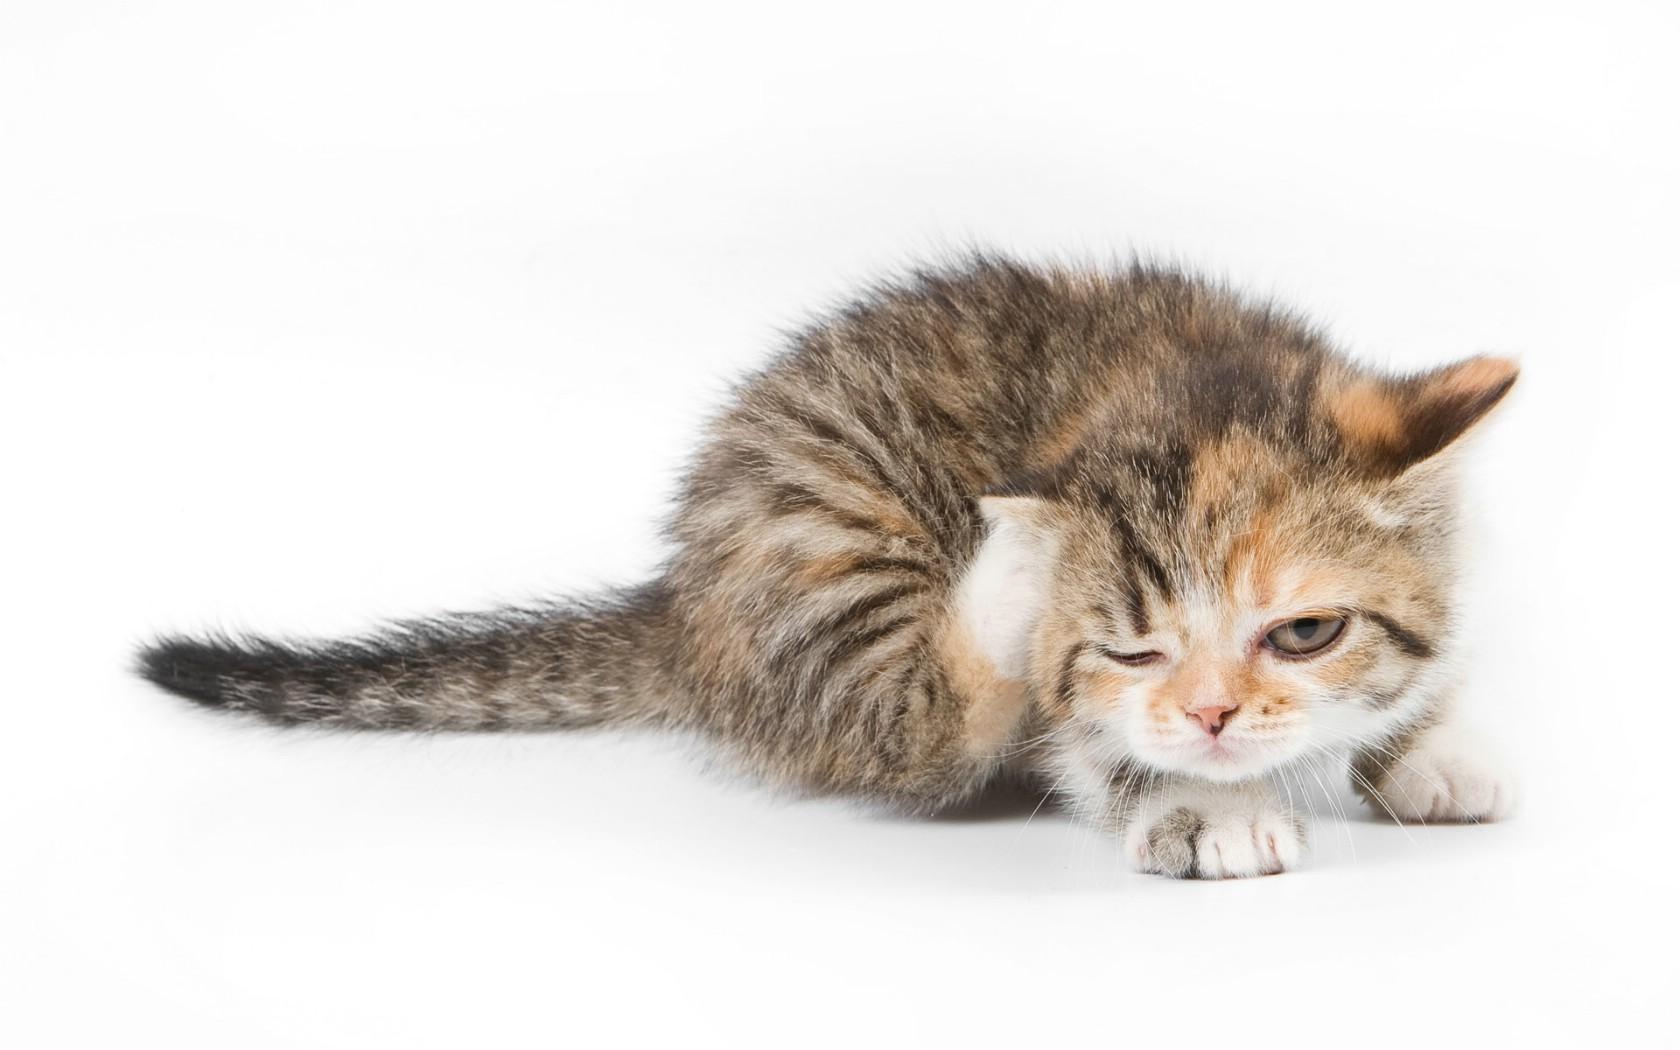 壁纸1680×1050可爱小猫壁纸1920x1200壁纸,可爱小猫壁纸